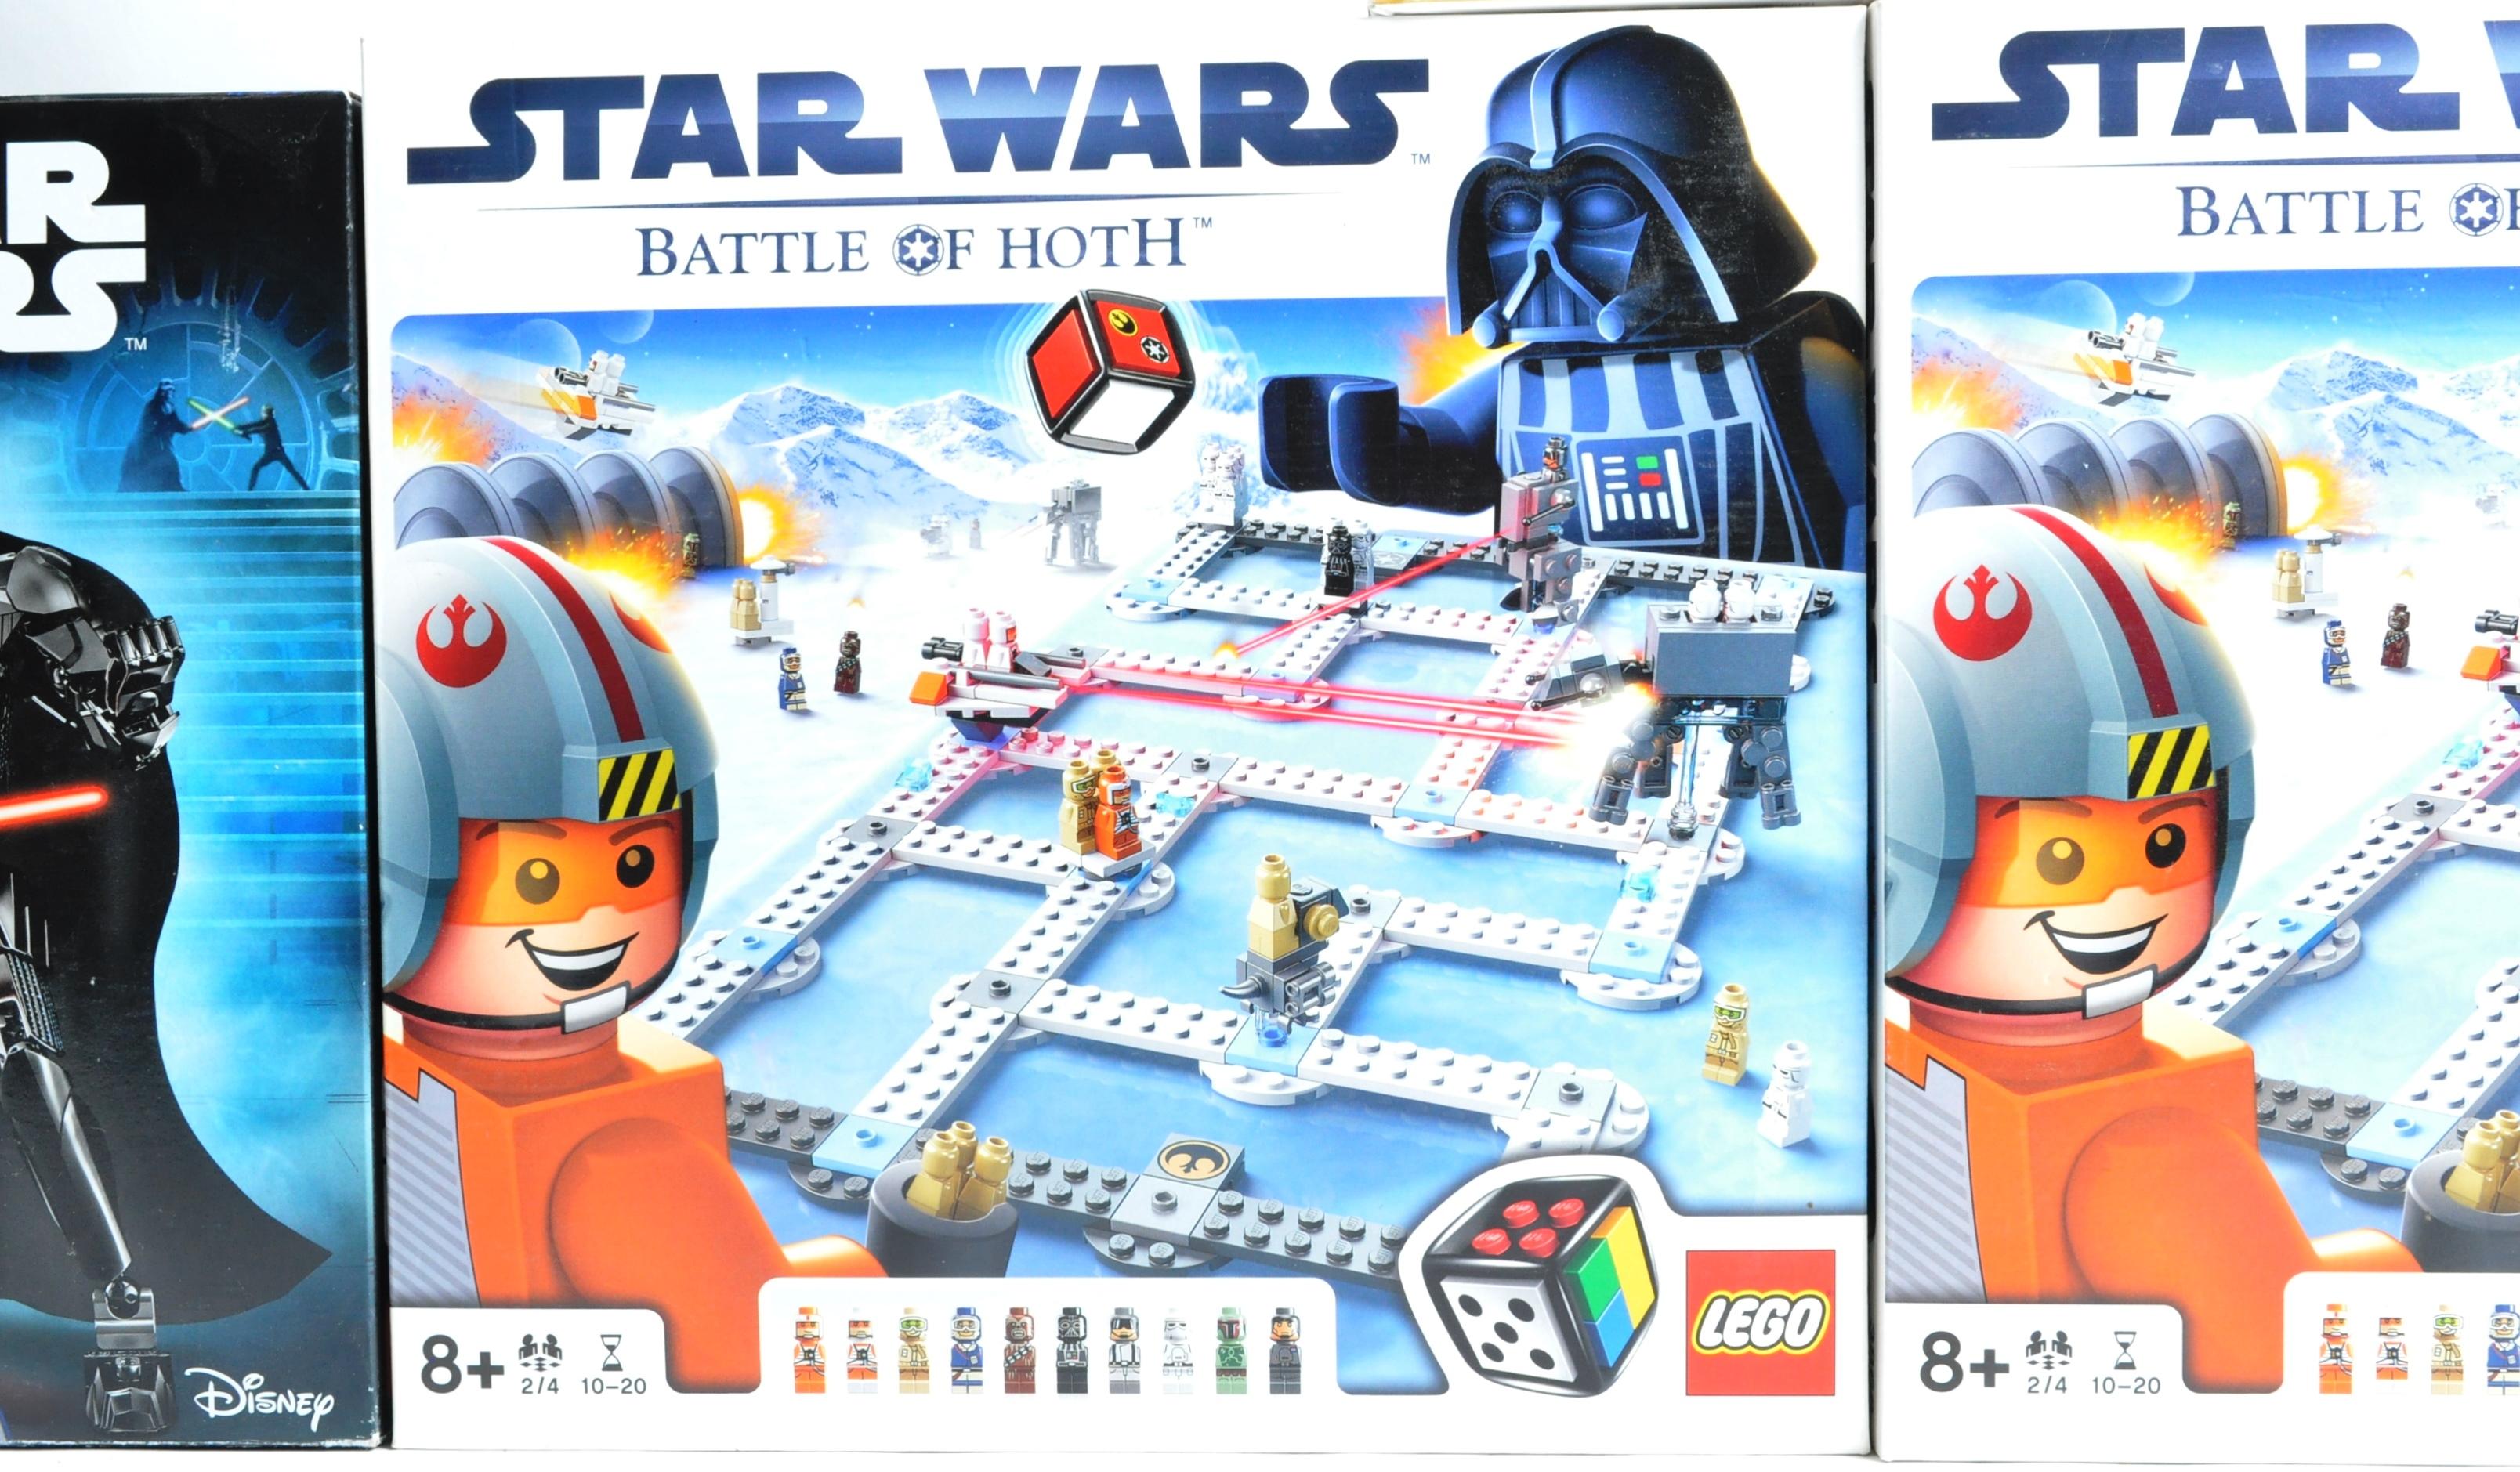 LEGO SETS - LEGO STAR WARS - 3866 / 75111 / 75114 / 75198 - Image 5 of 8